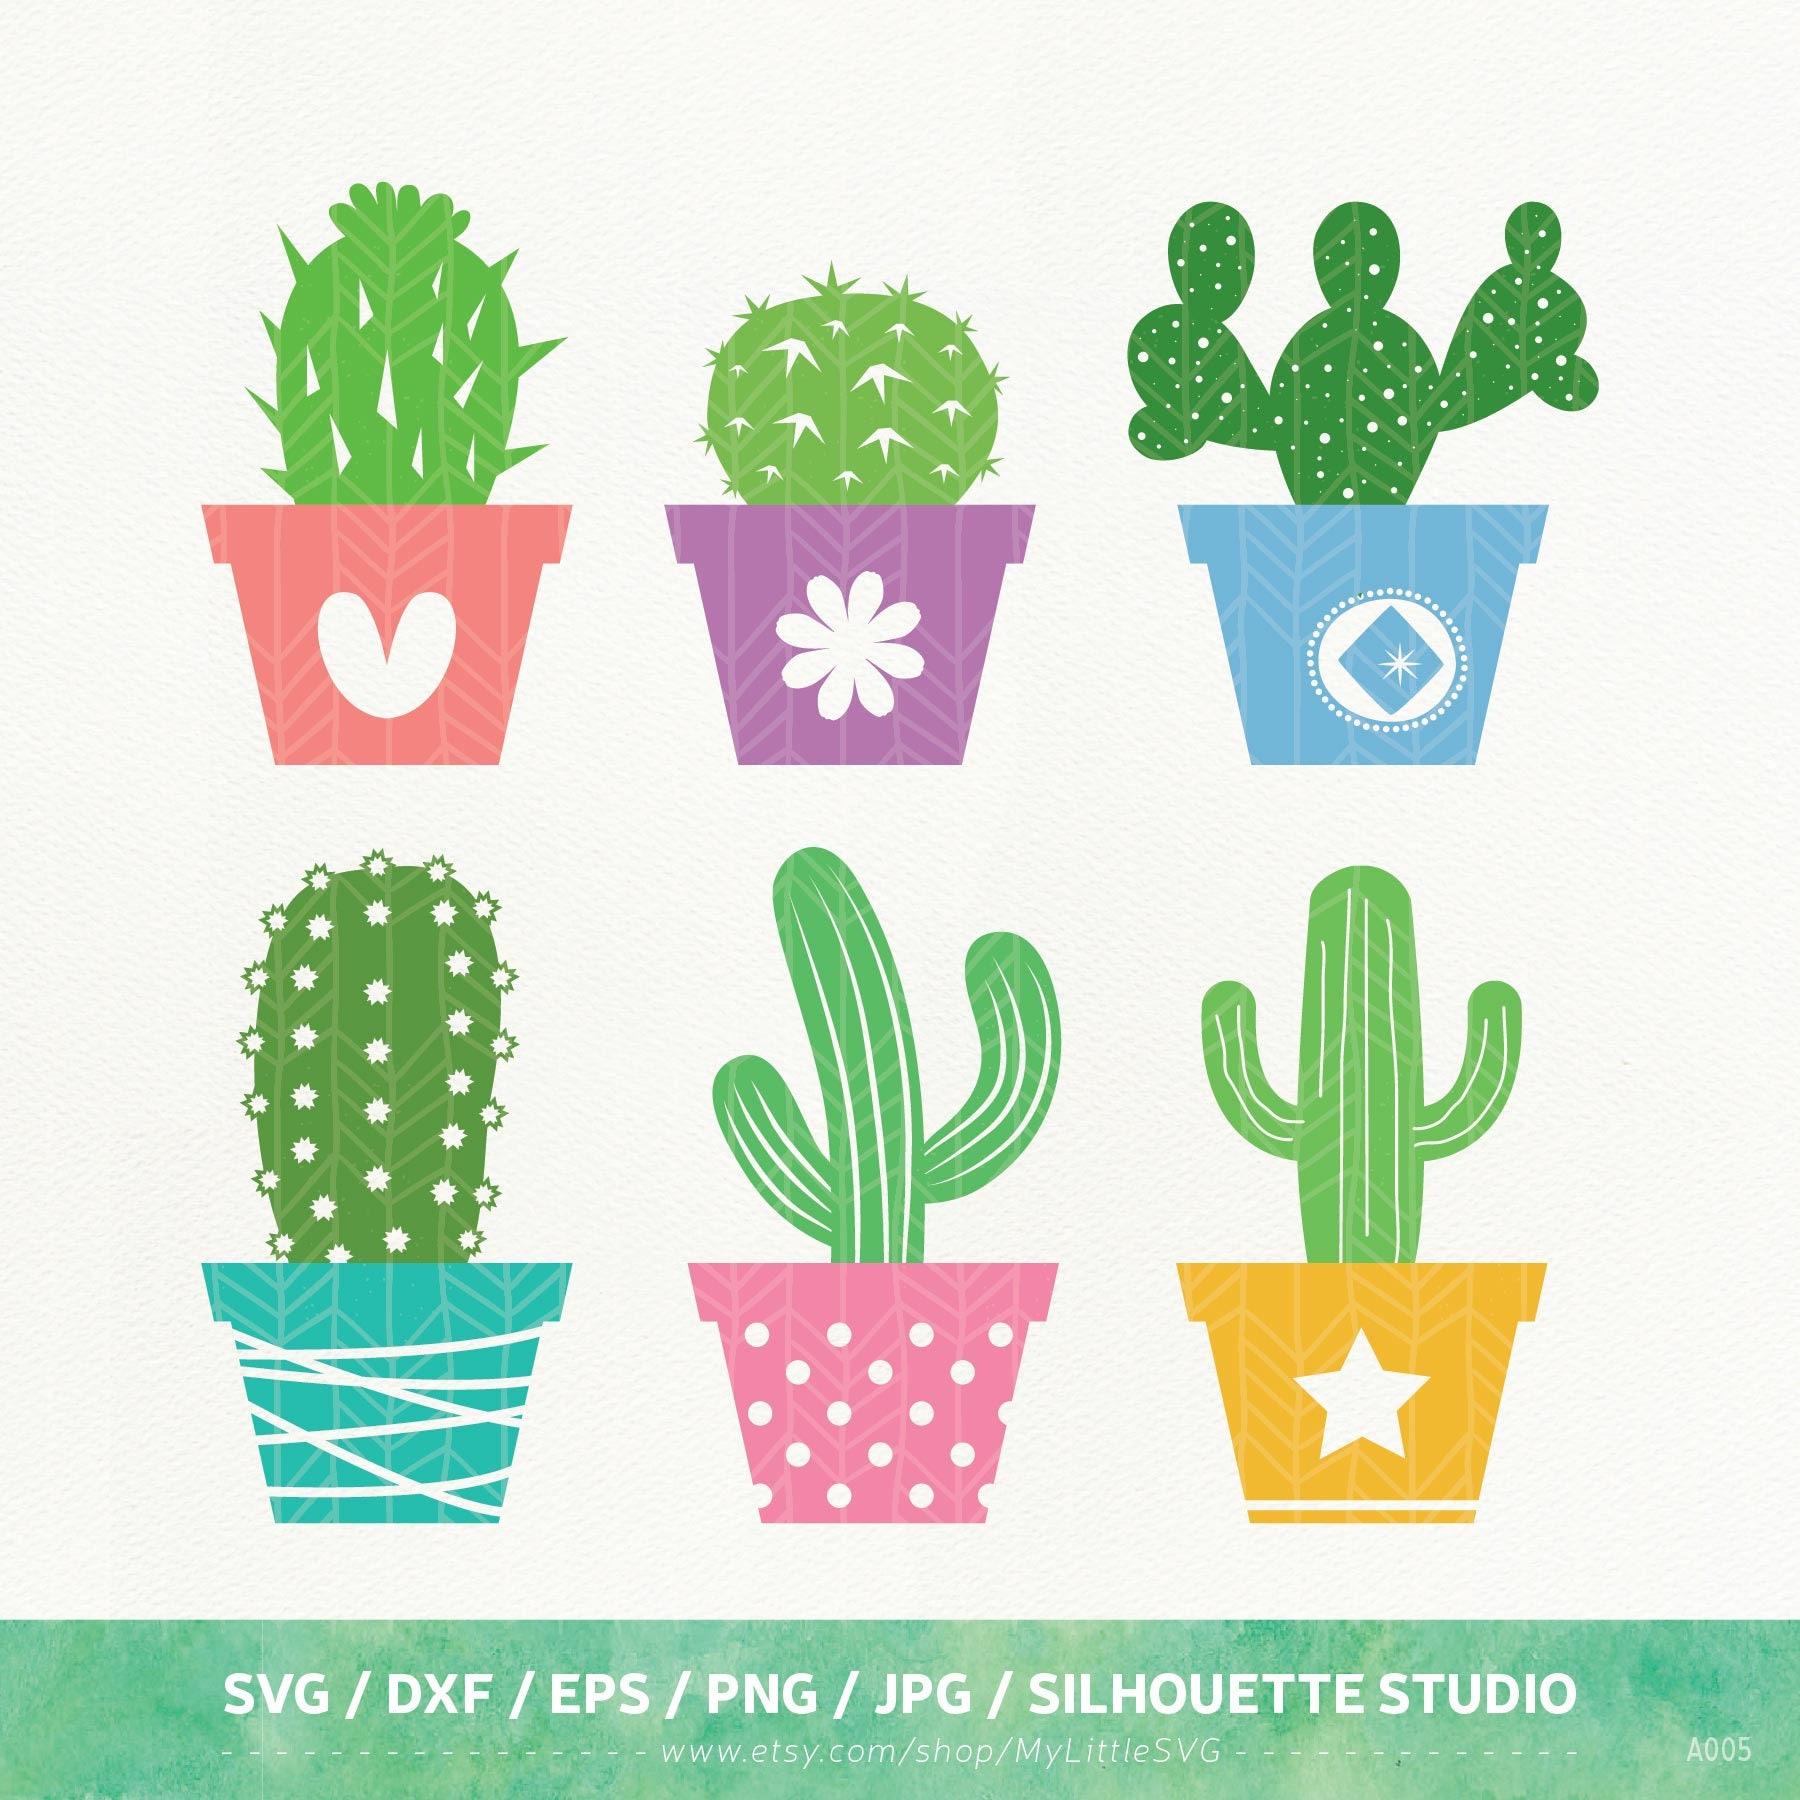 Cactus Svg Files Cactus Dxf Png Eps Silhouette Studio